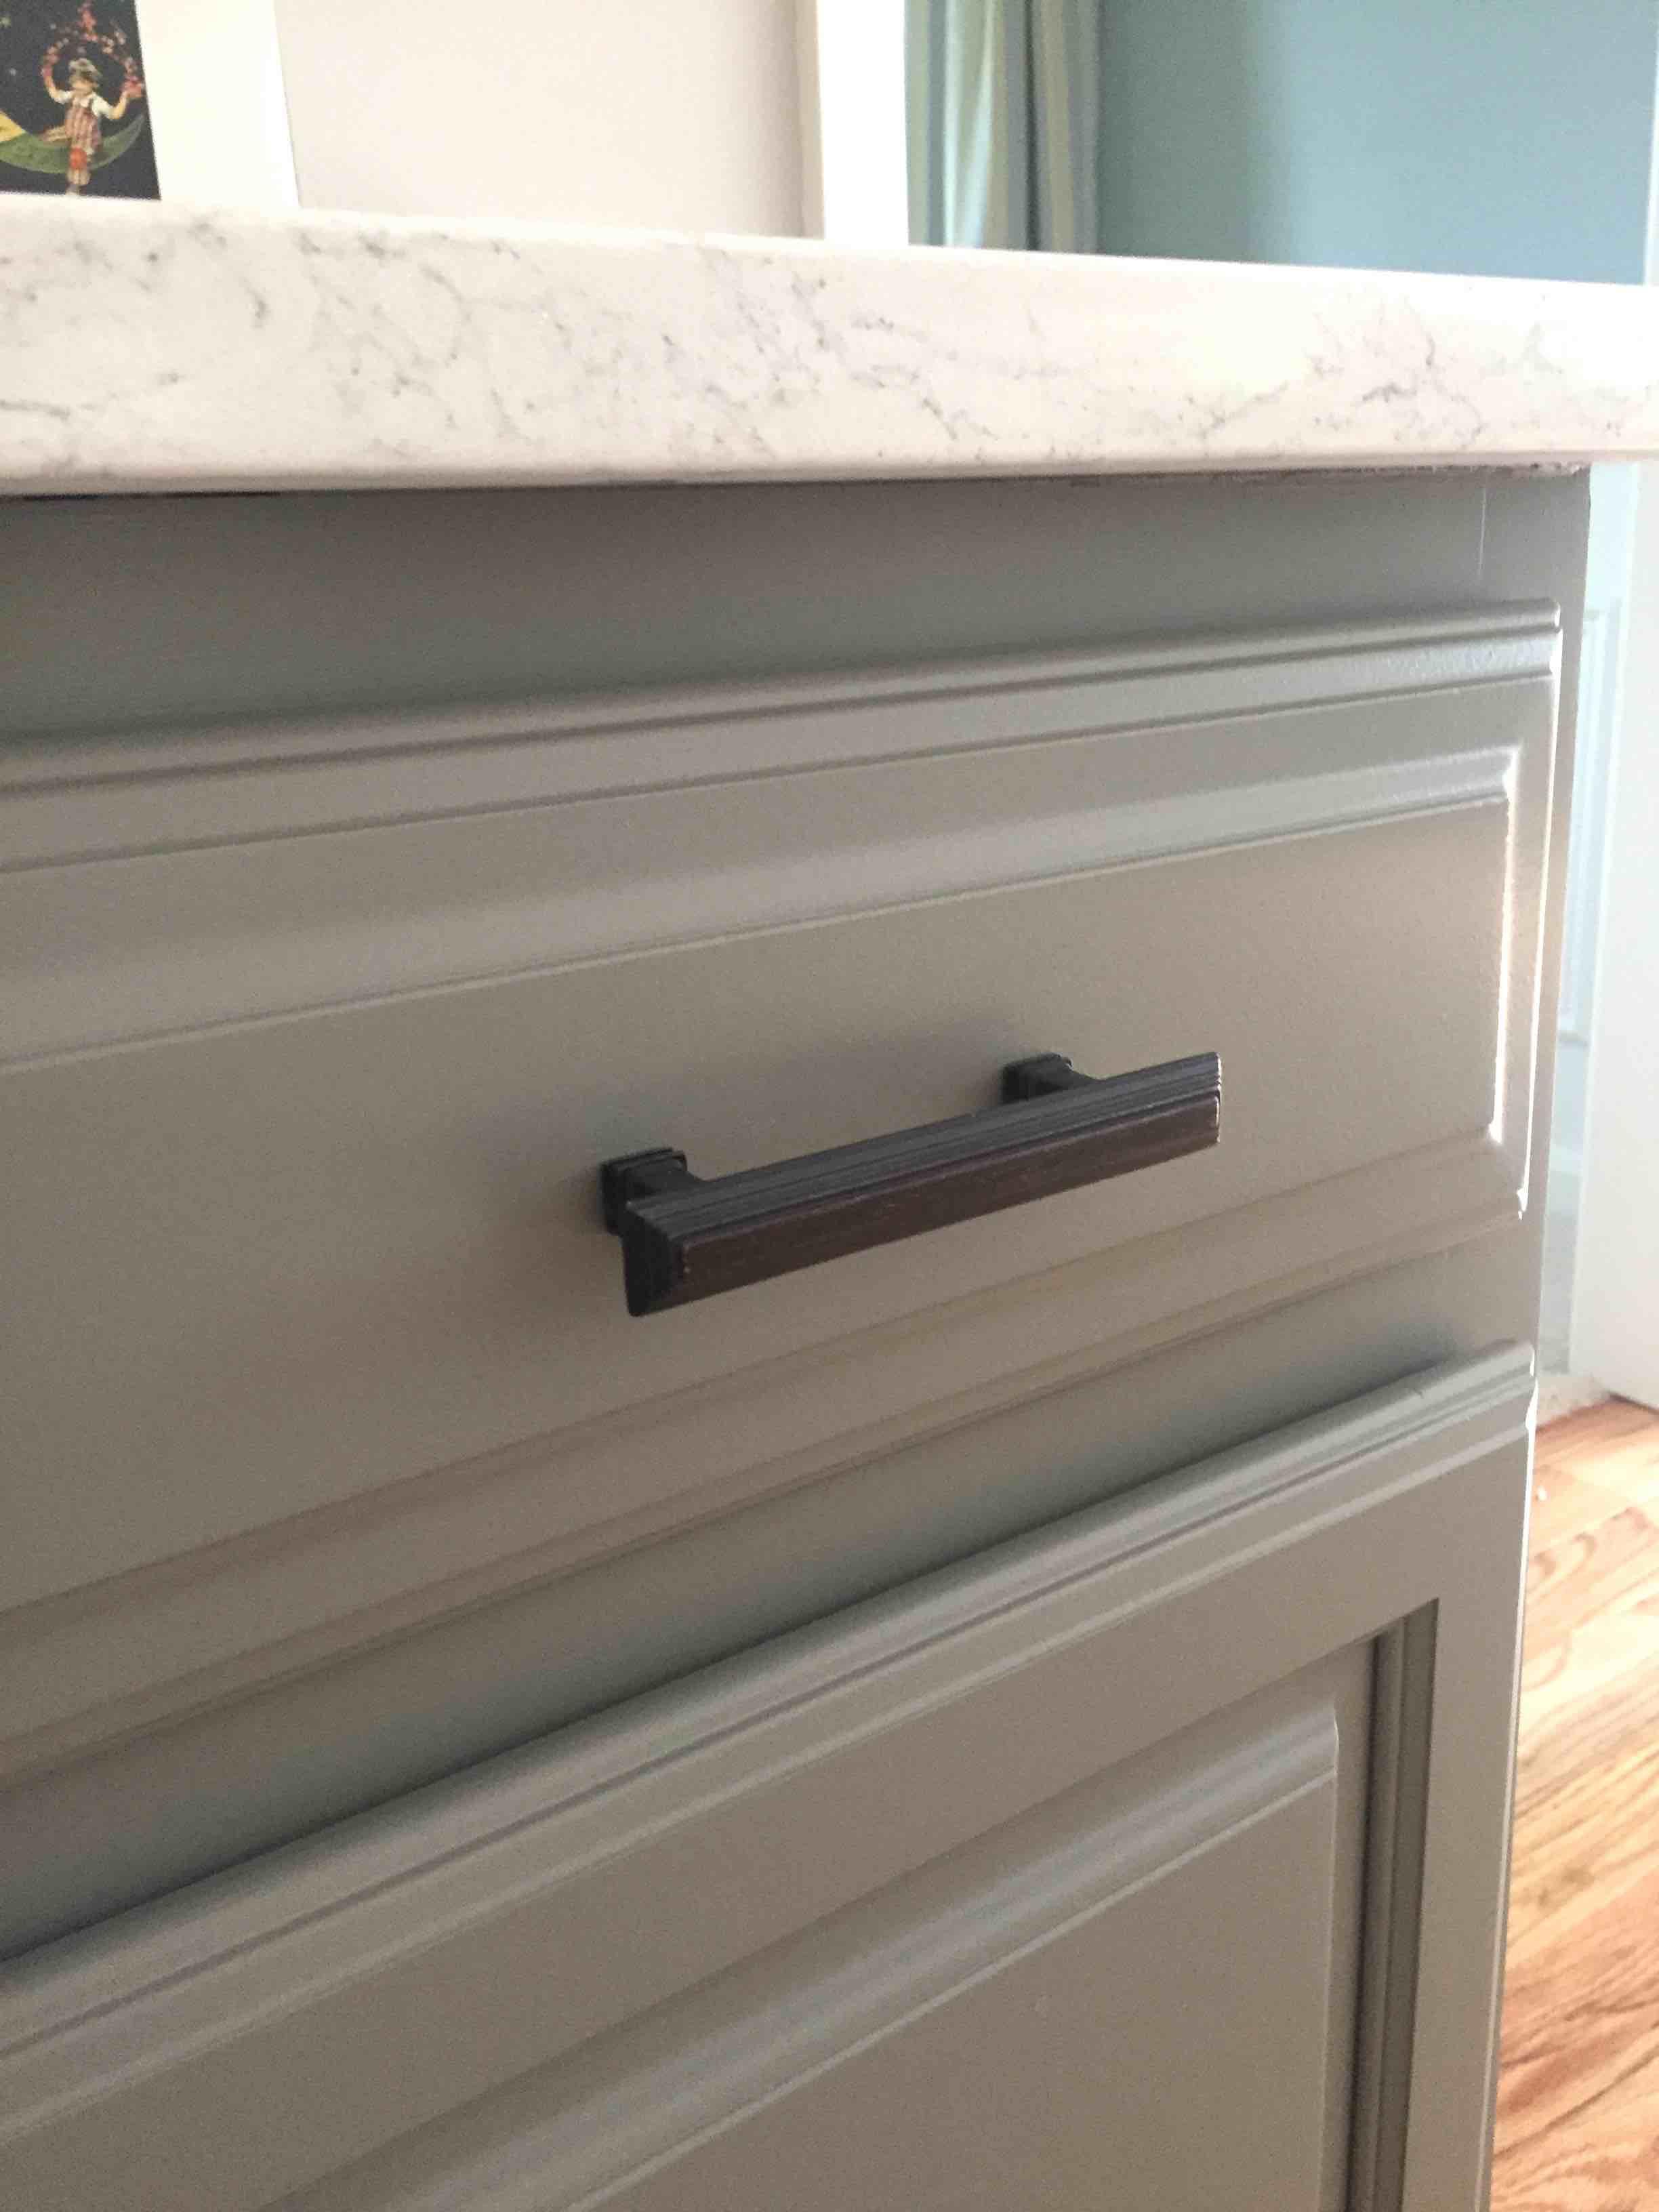 Hardward For Kitchen Cabinets